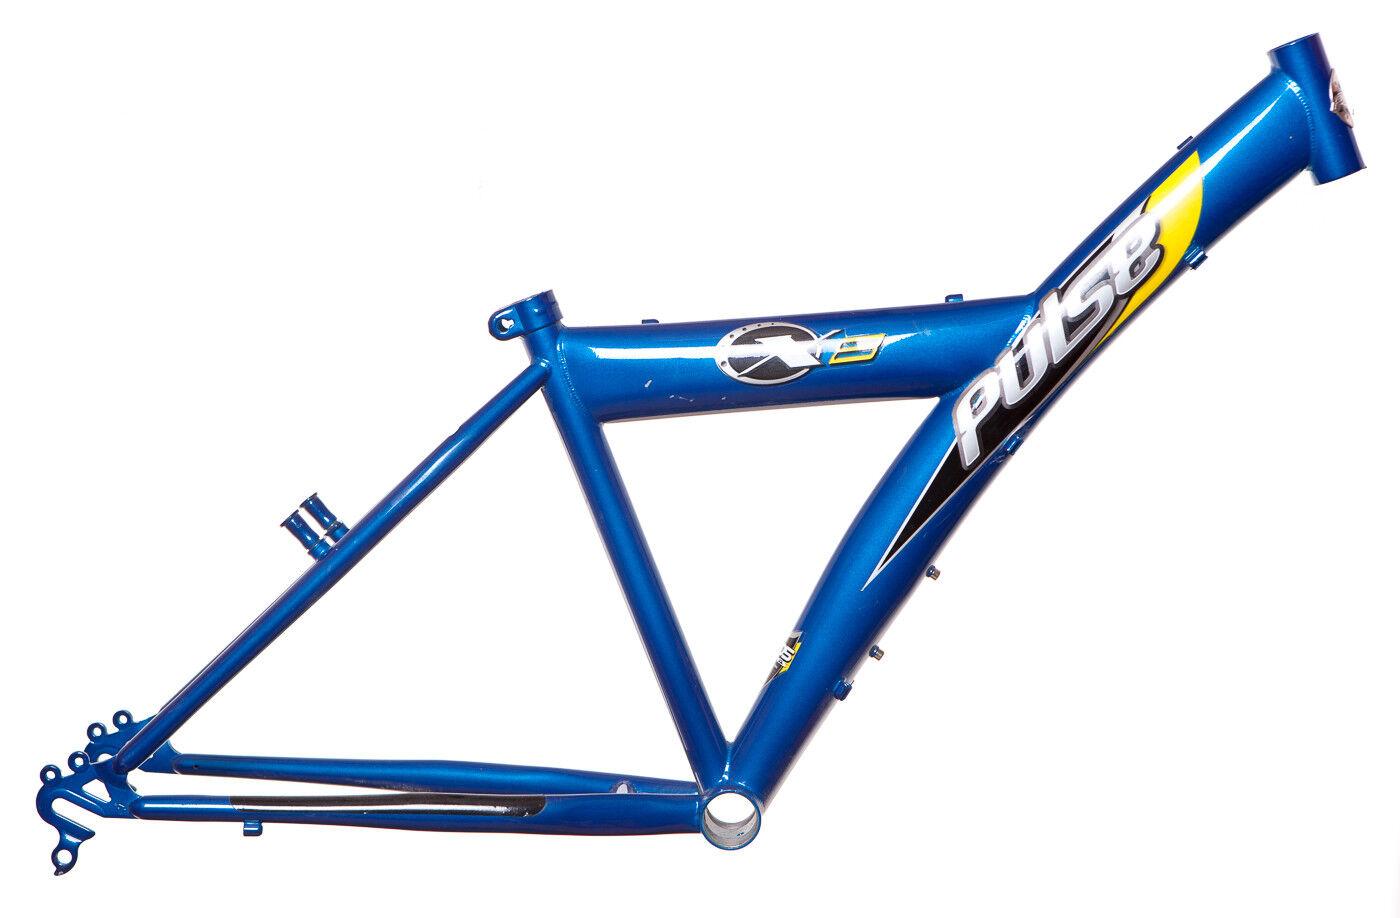 Pulse  X 8 24  Bicicleta Cuadrado de Bicicleta (Tamaño 14 ) Turquesa Azul Freno  tienda en linea